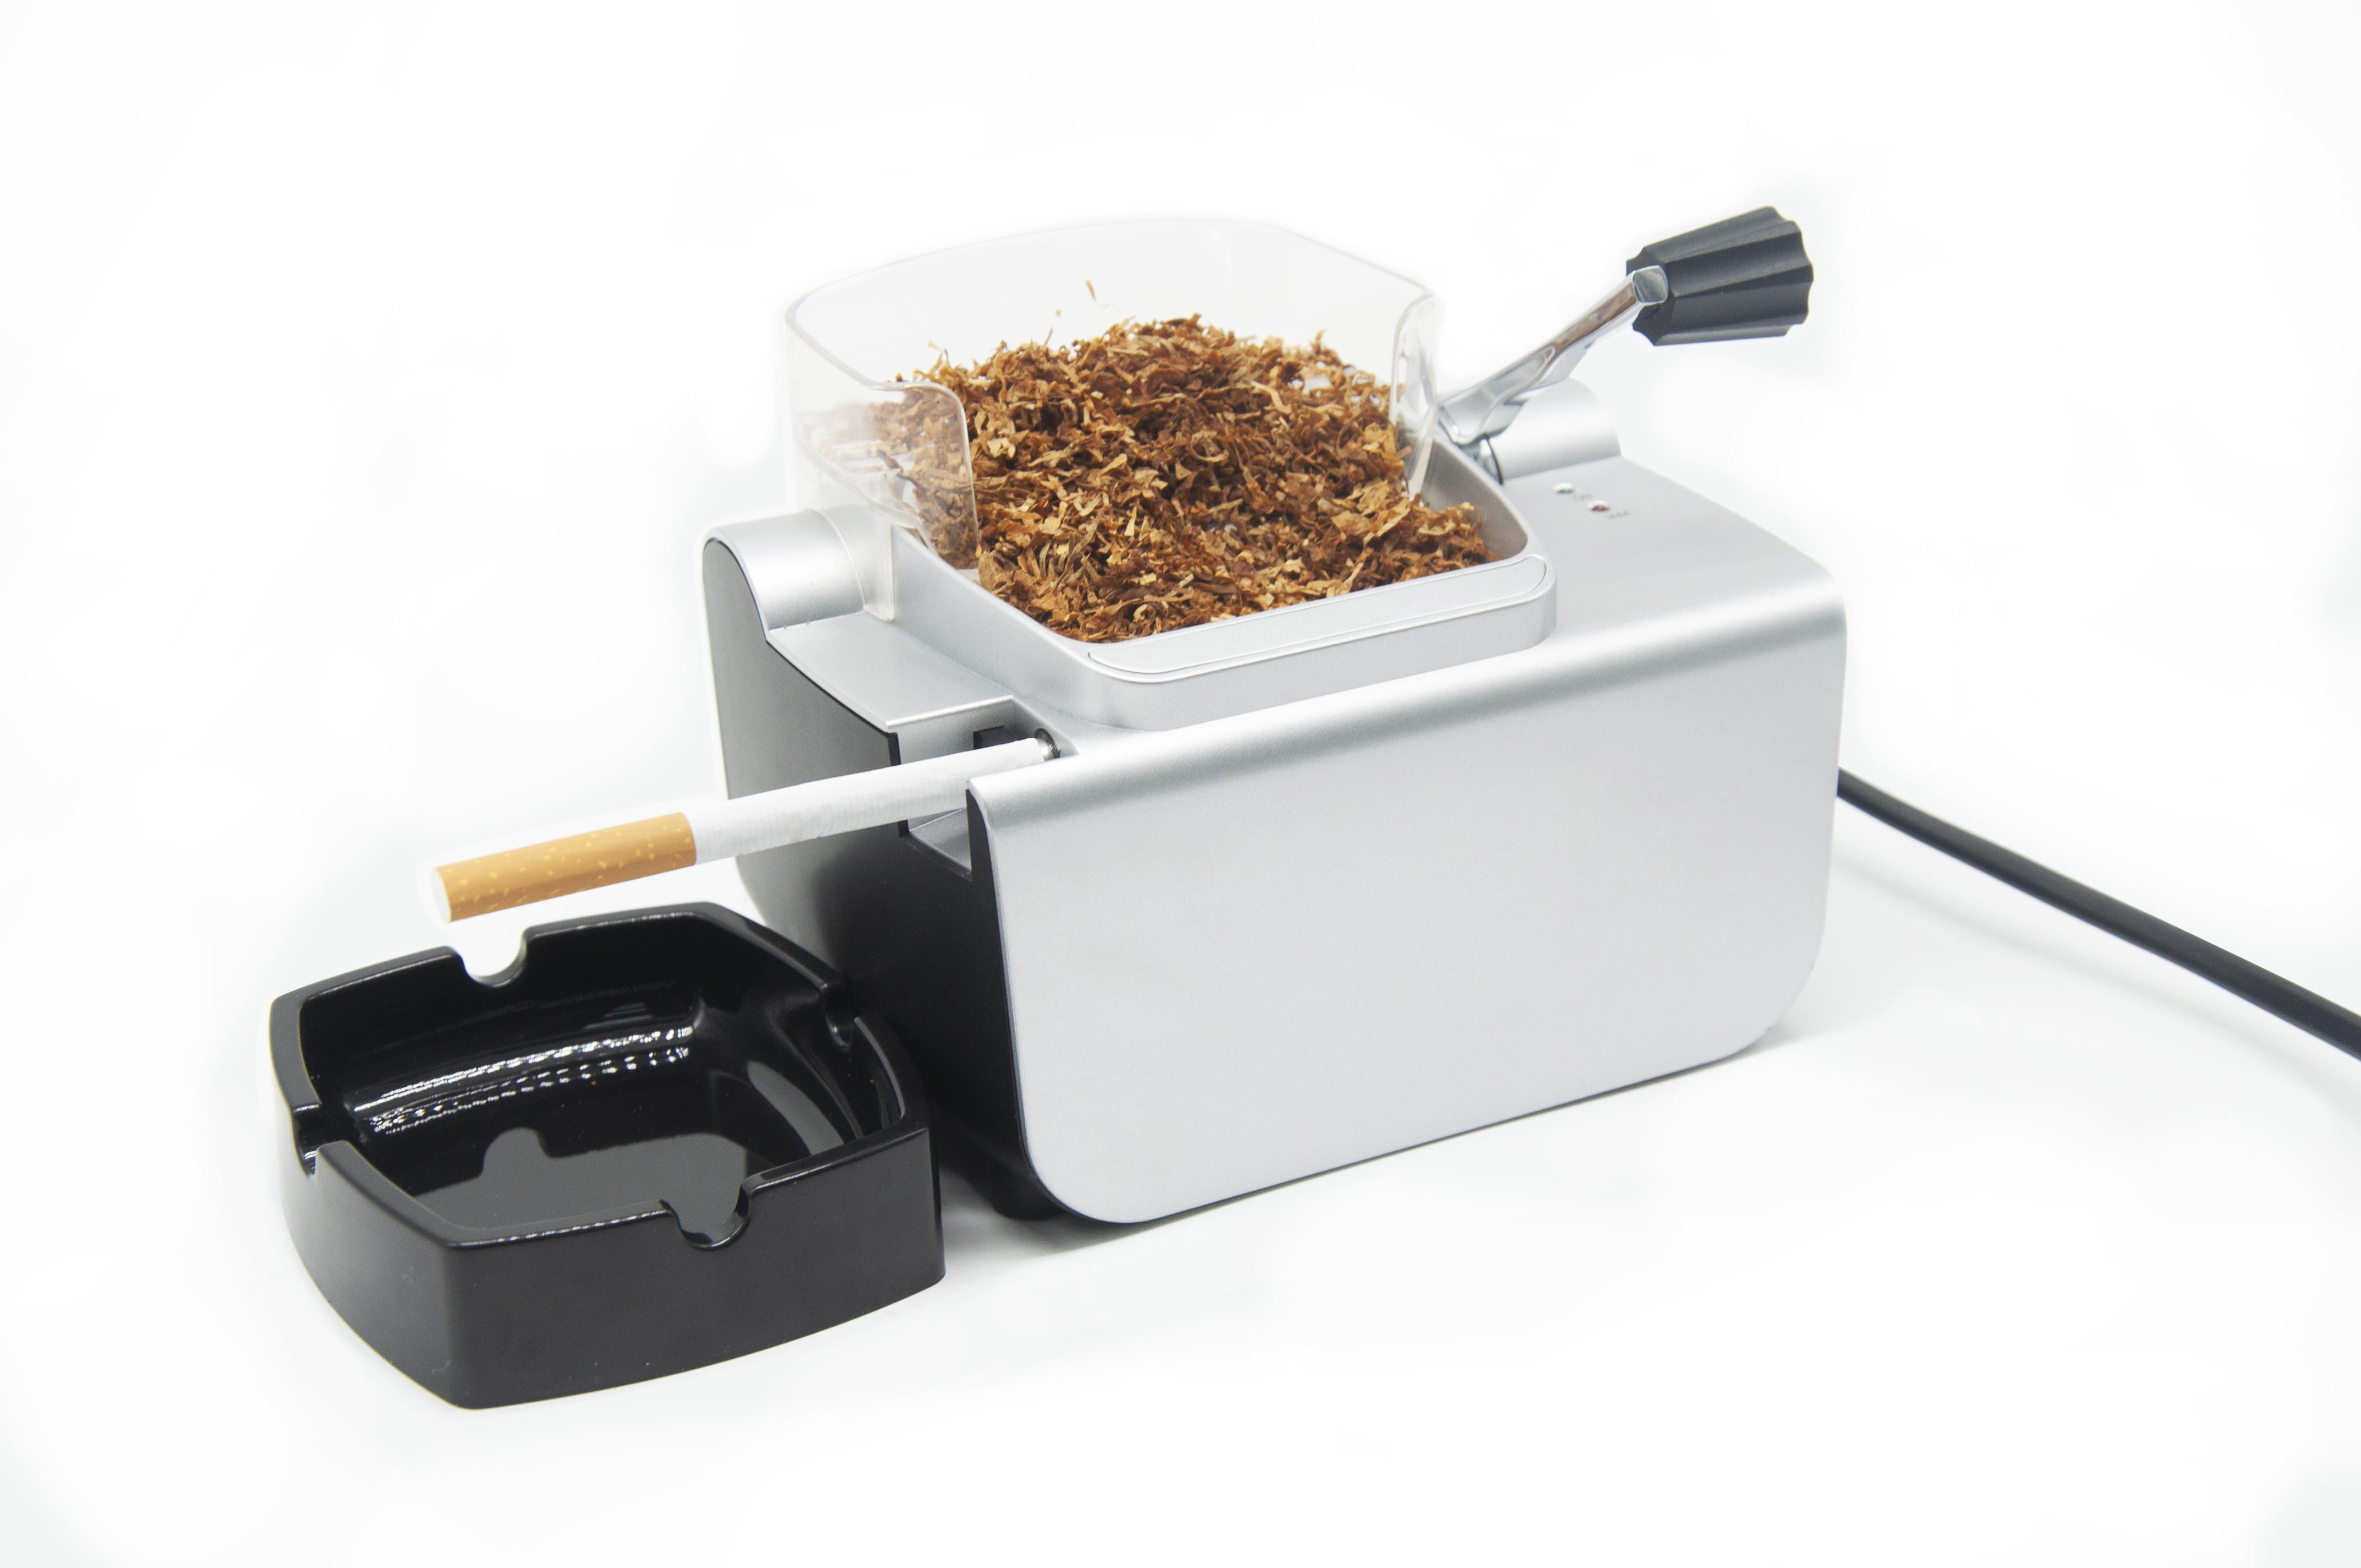 Powerfiller 2 - elektrische Stopfmaschine